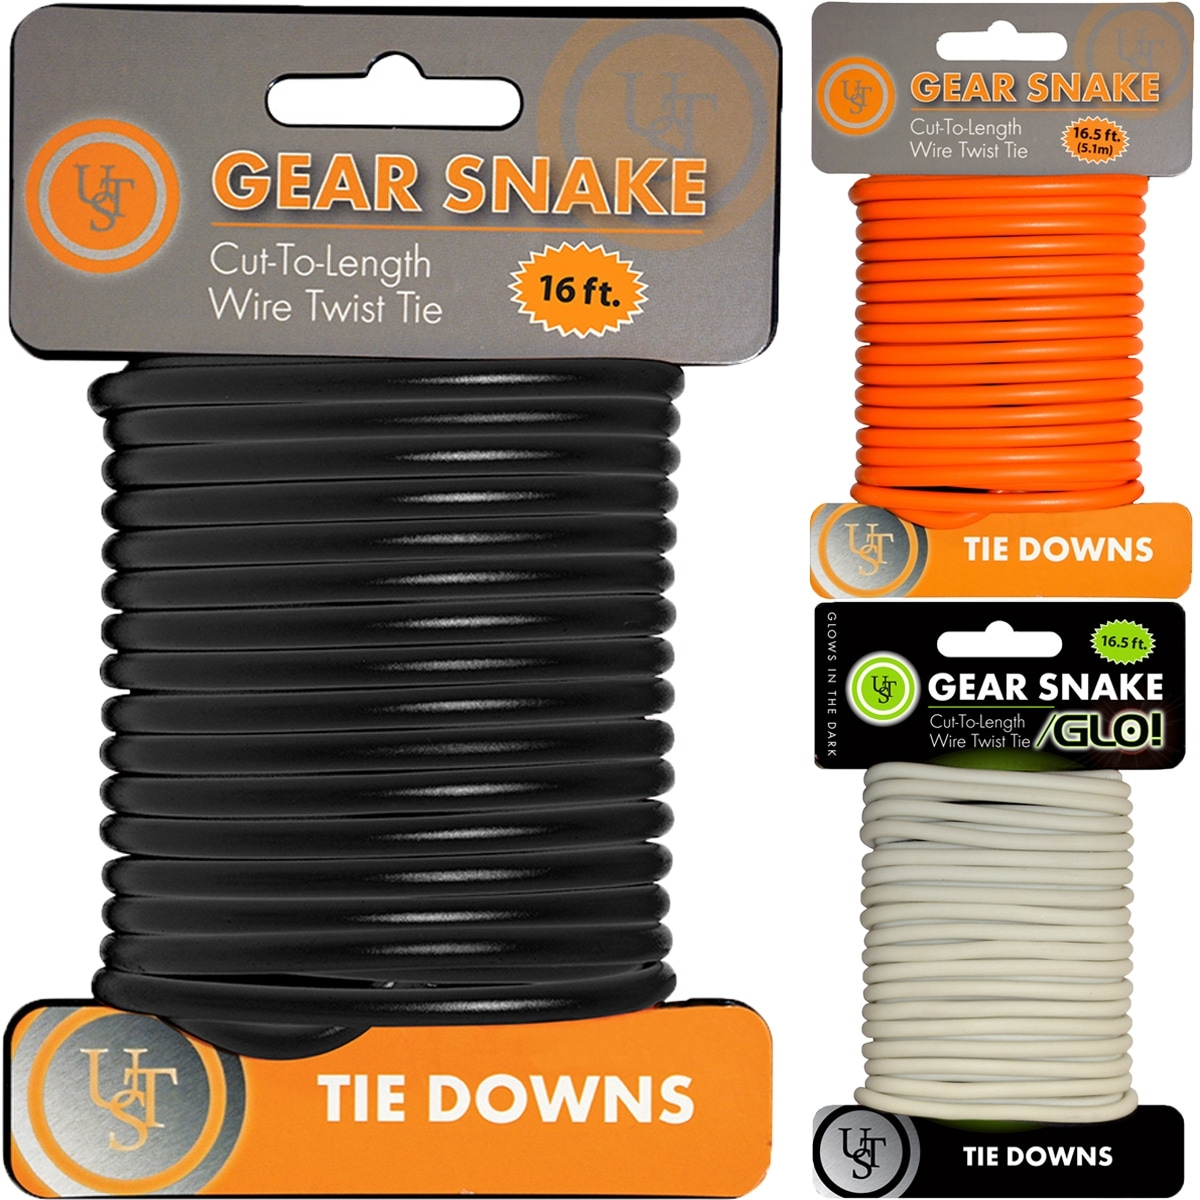 Ust Gear Snake Bendable Steel Wire Cord